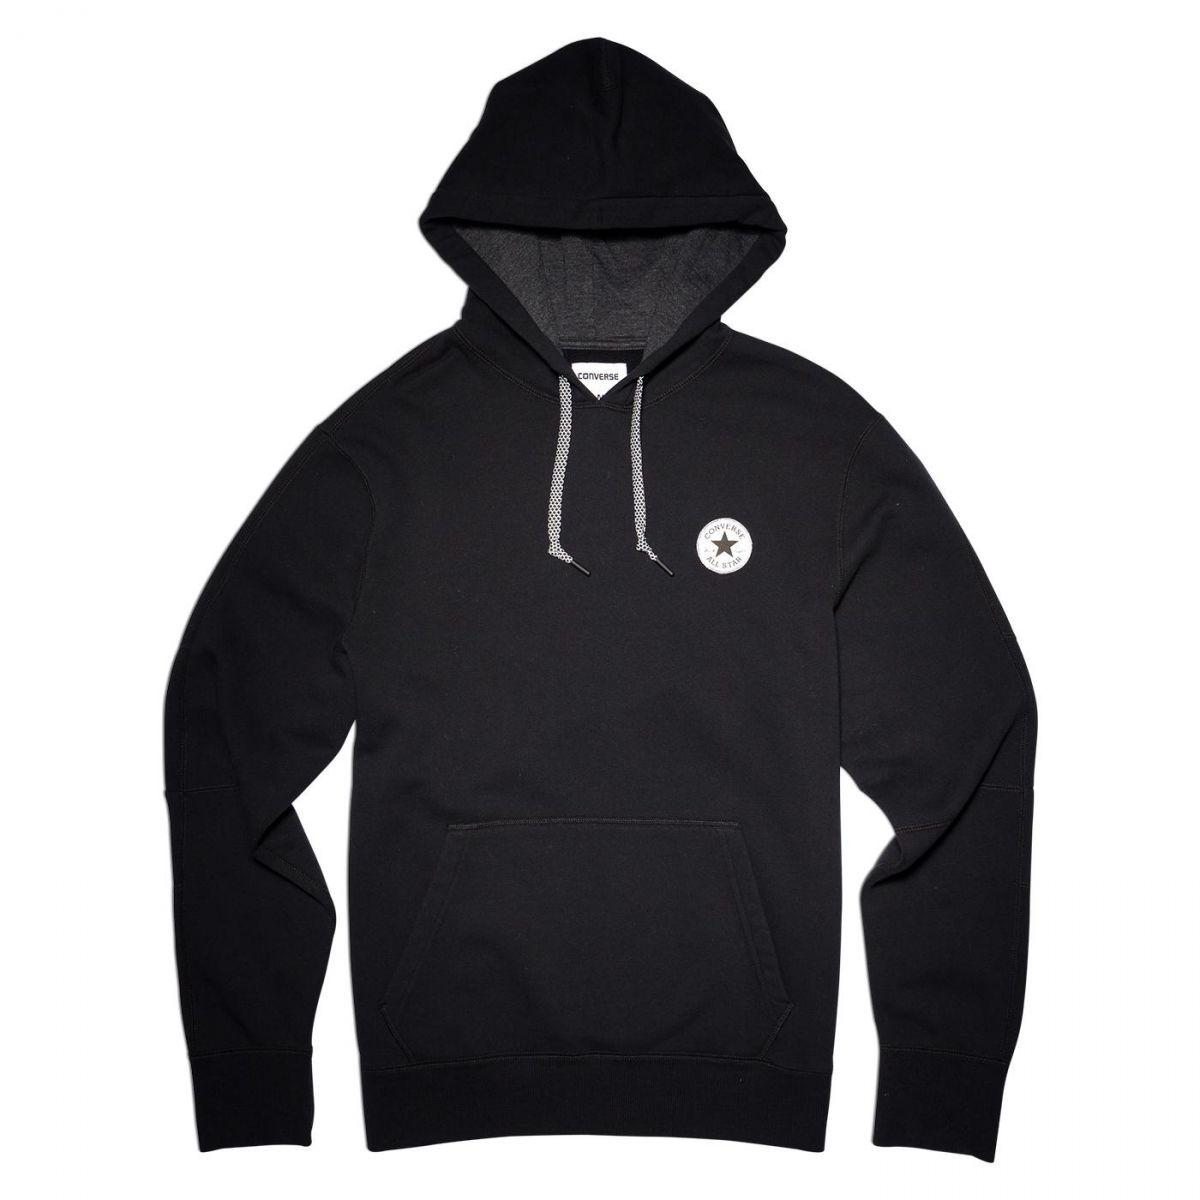 sport klingenmaier converse core reflective popover hoodie herren kapuzenpullover schwarz. Black Bedroom Furniture Sets. Home Design Ideas